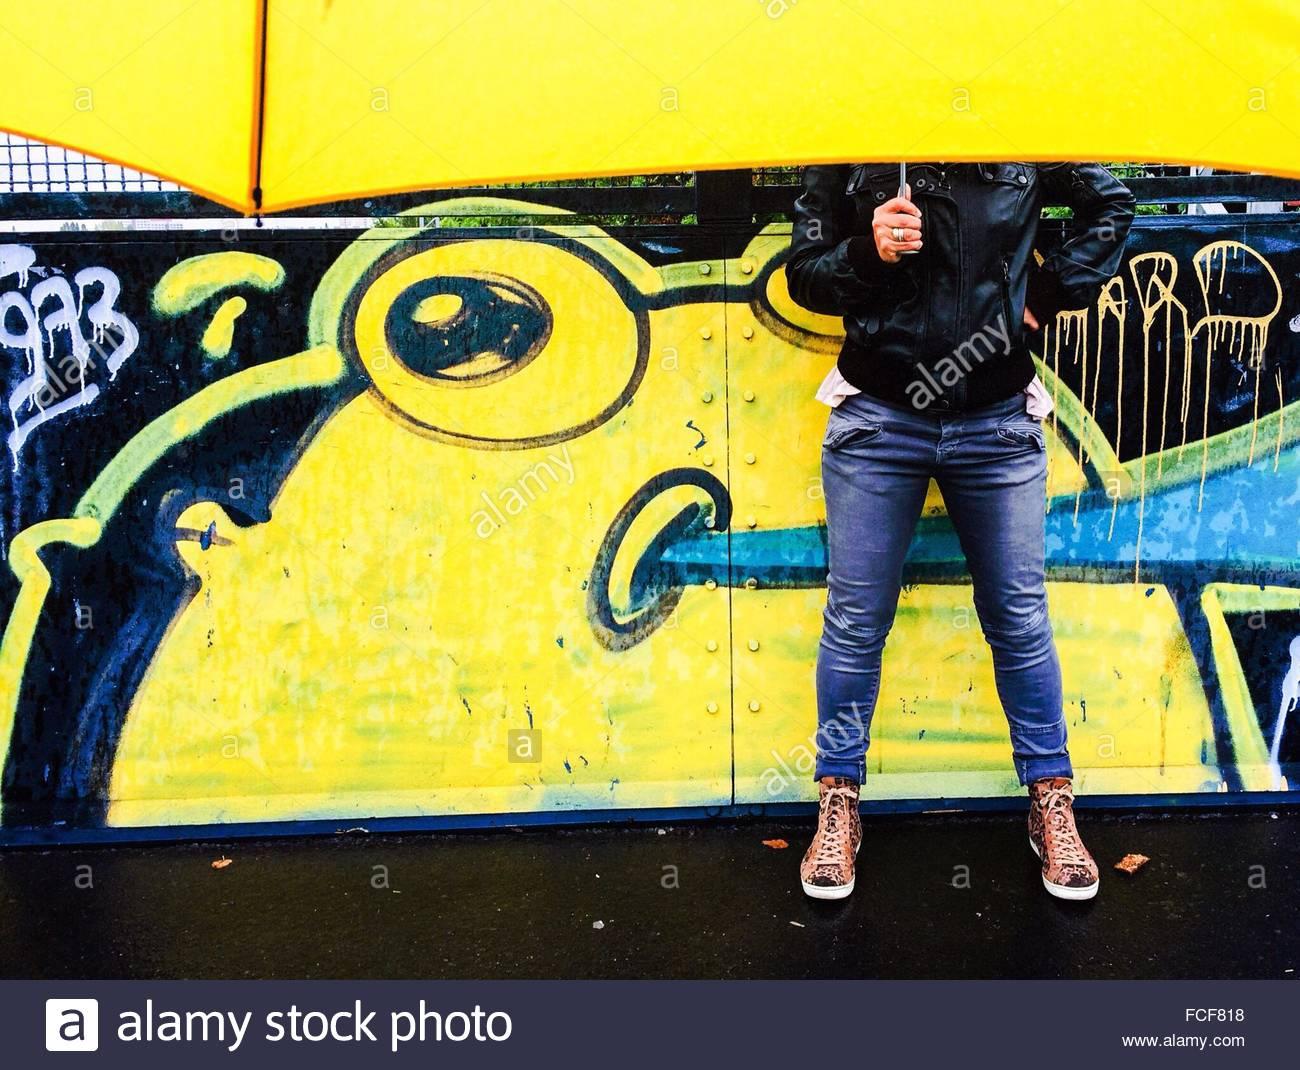 Graffiti Wall Art Stock Photos & Graffiti Wall Art Stock Images - Alamy